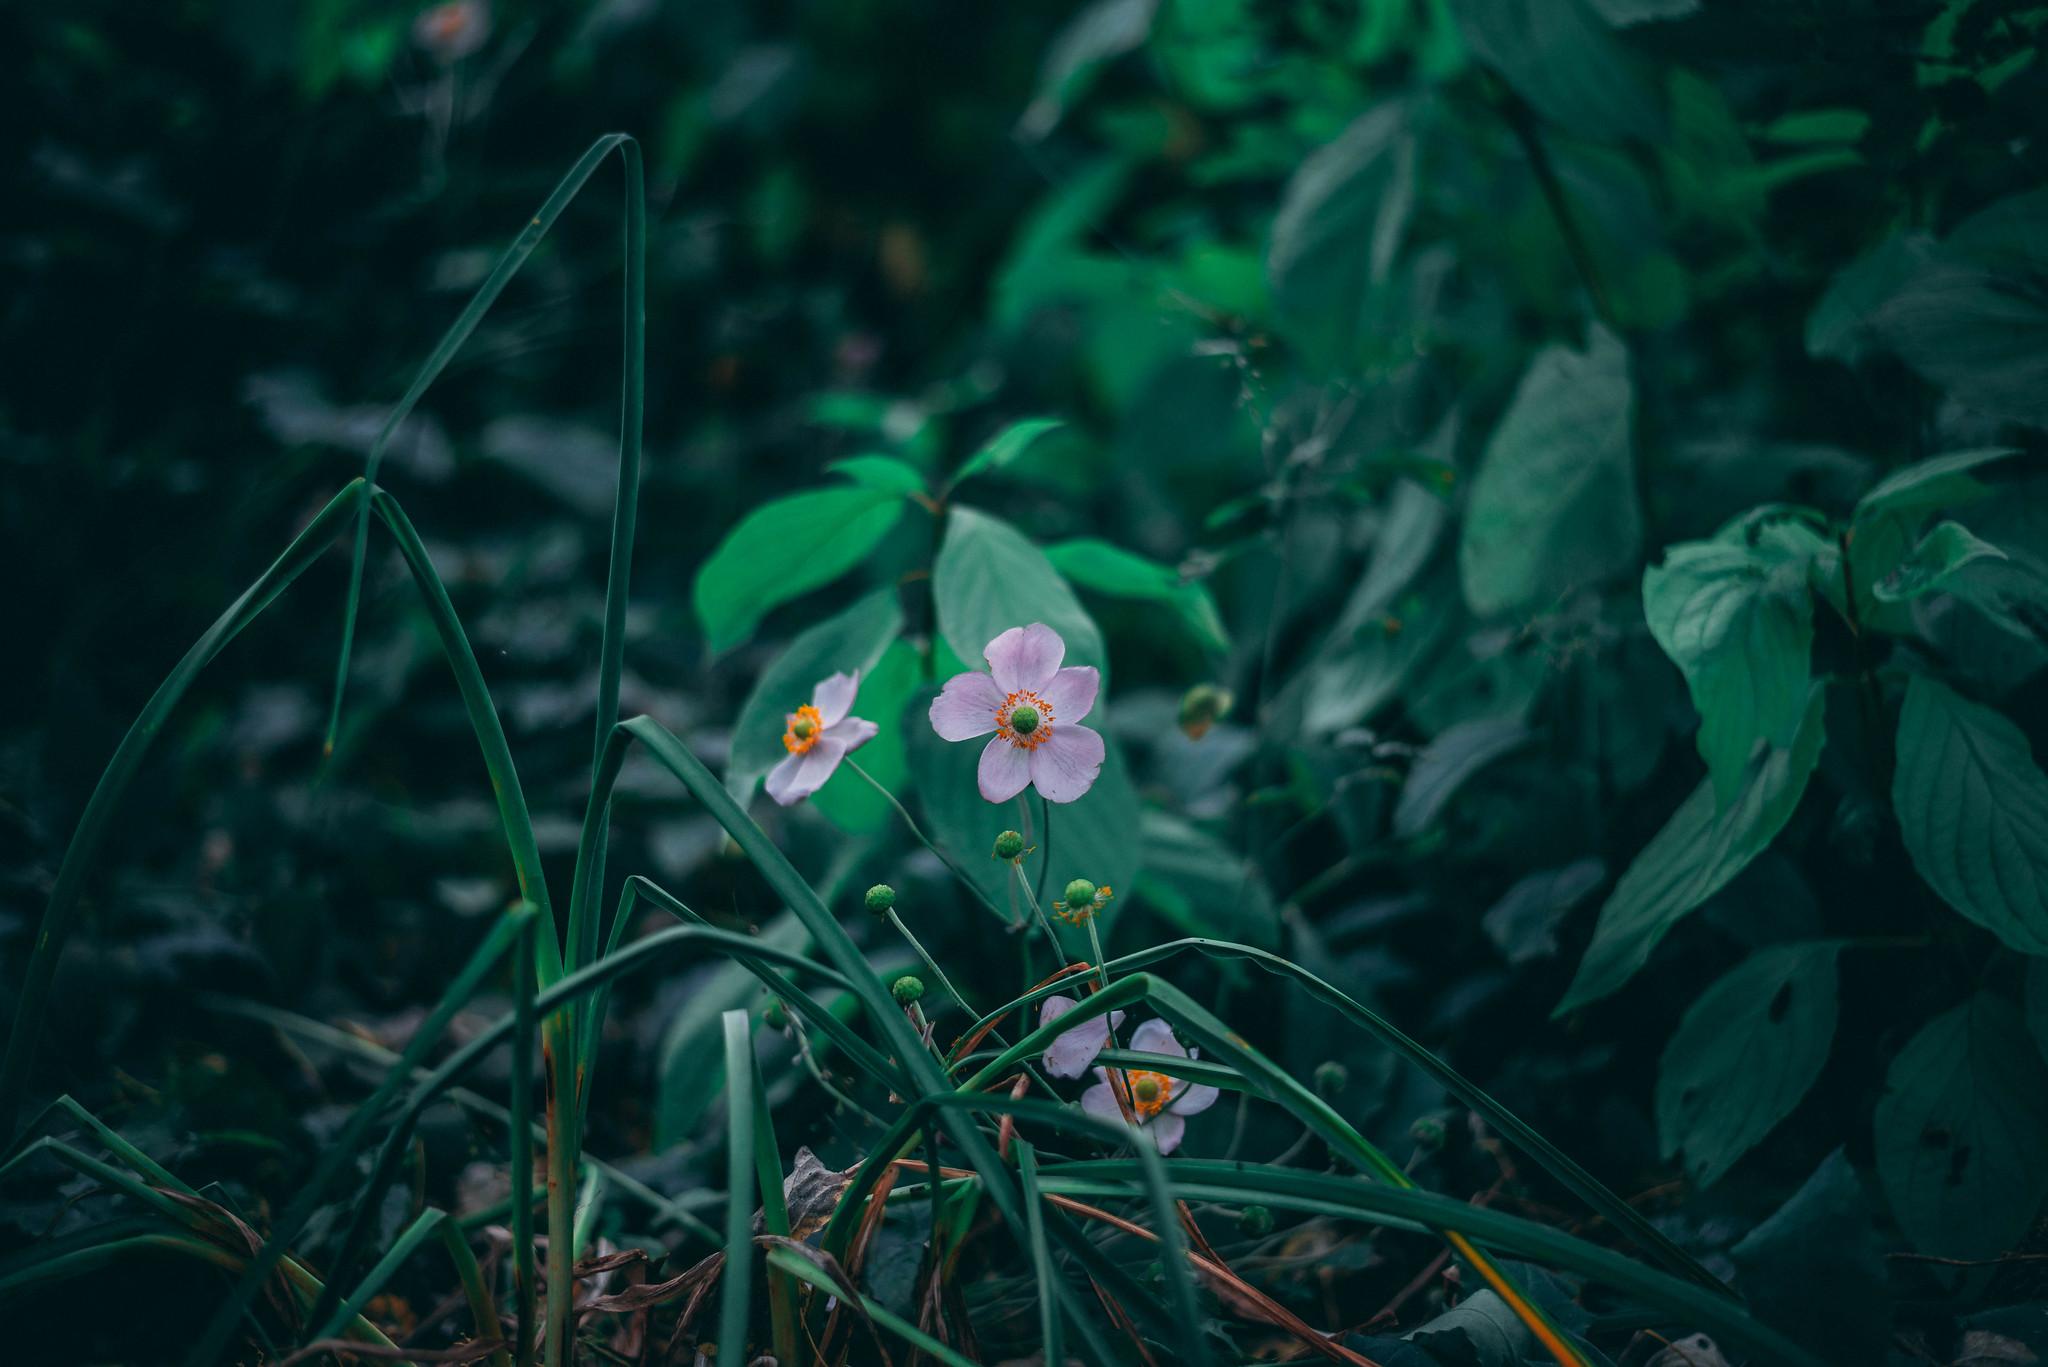 Single flower in October